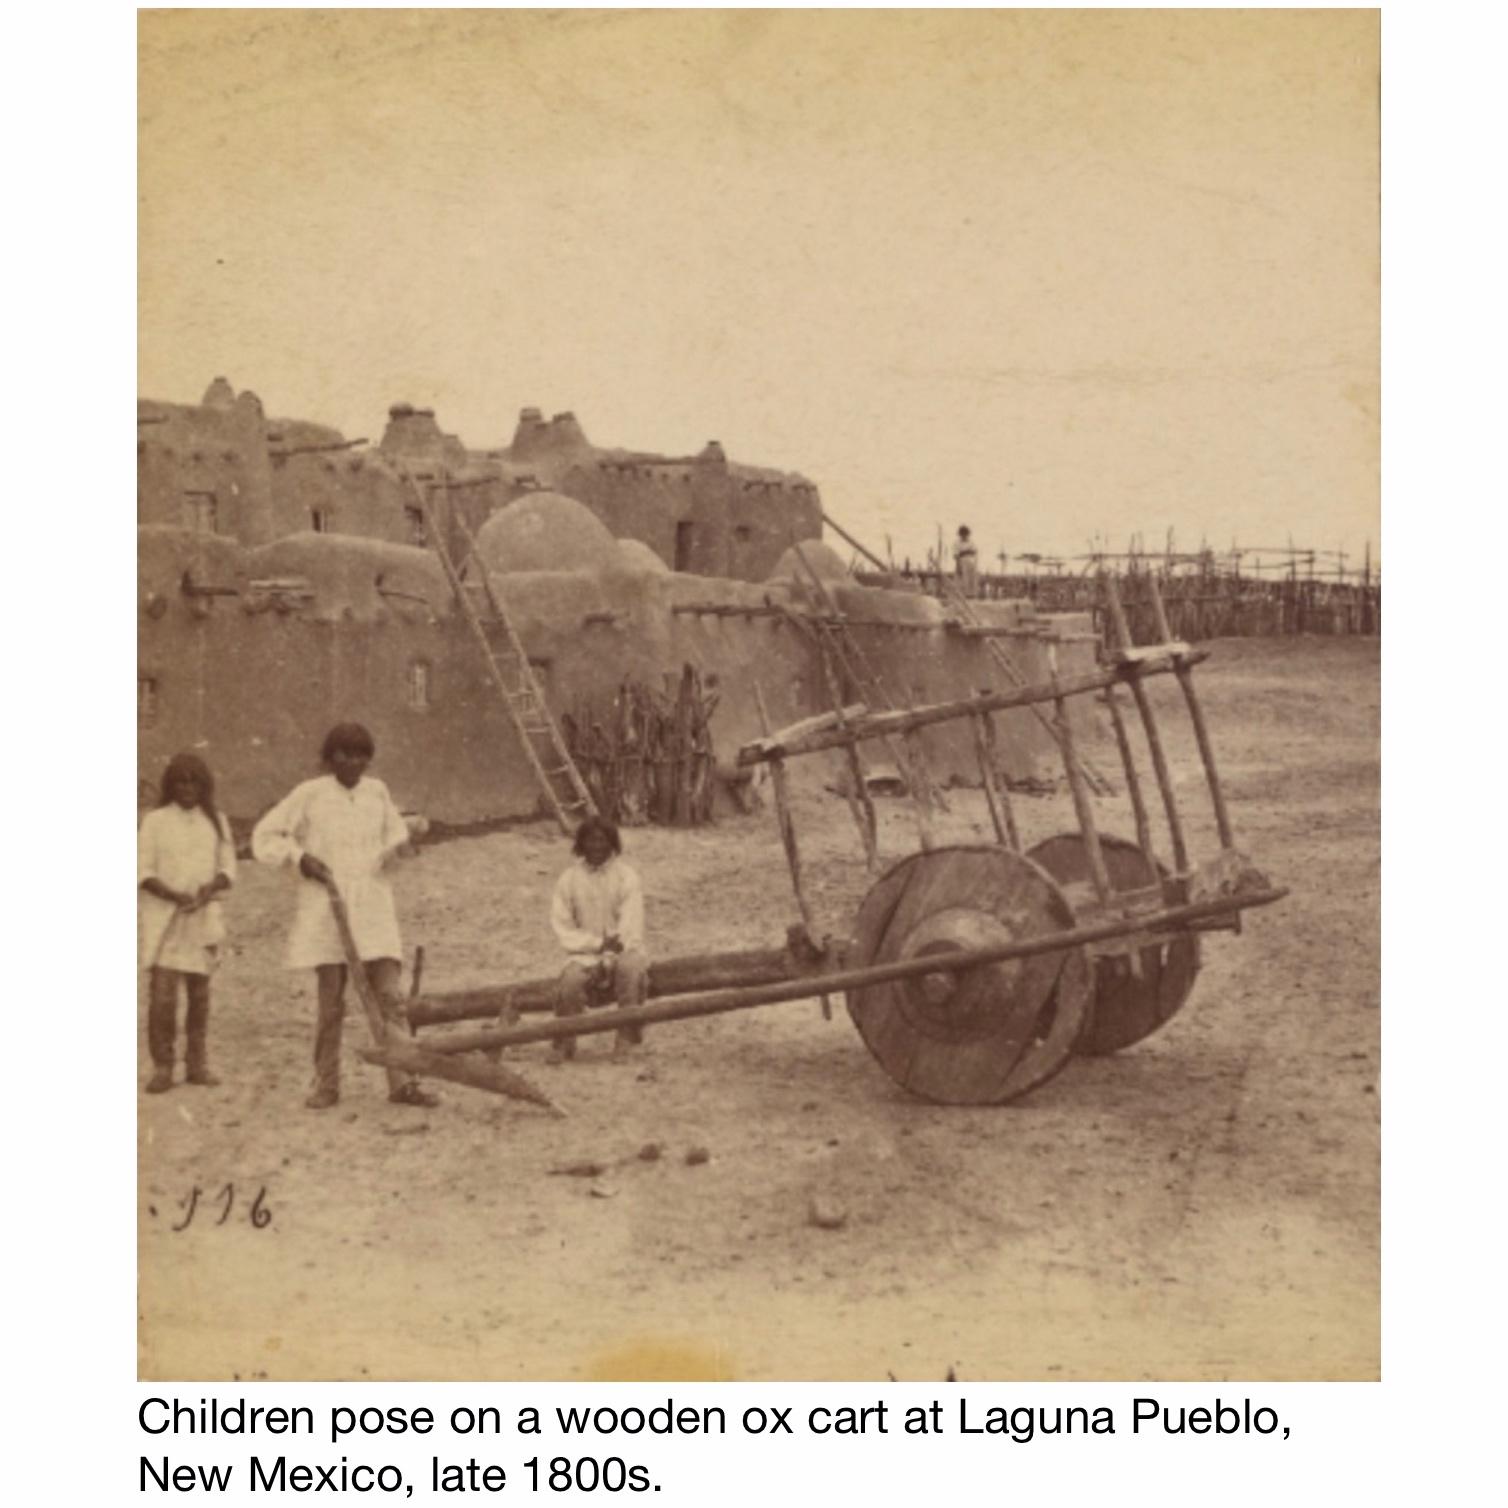 5_Ox cart at Laguna Pueblo, New Mexico.jpg